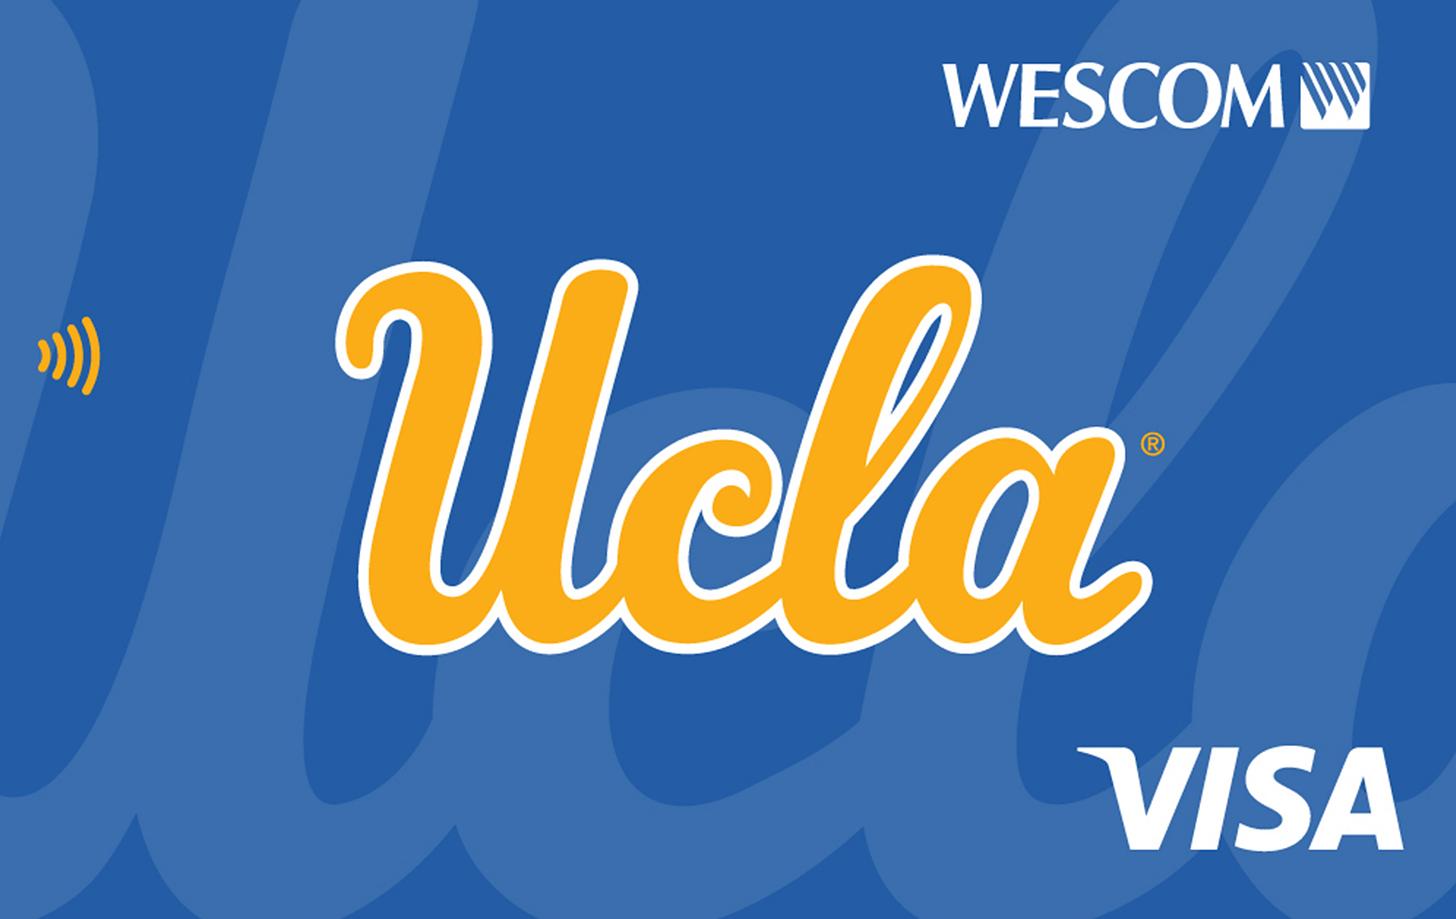 UCLA Edge Credit Card